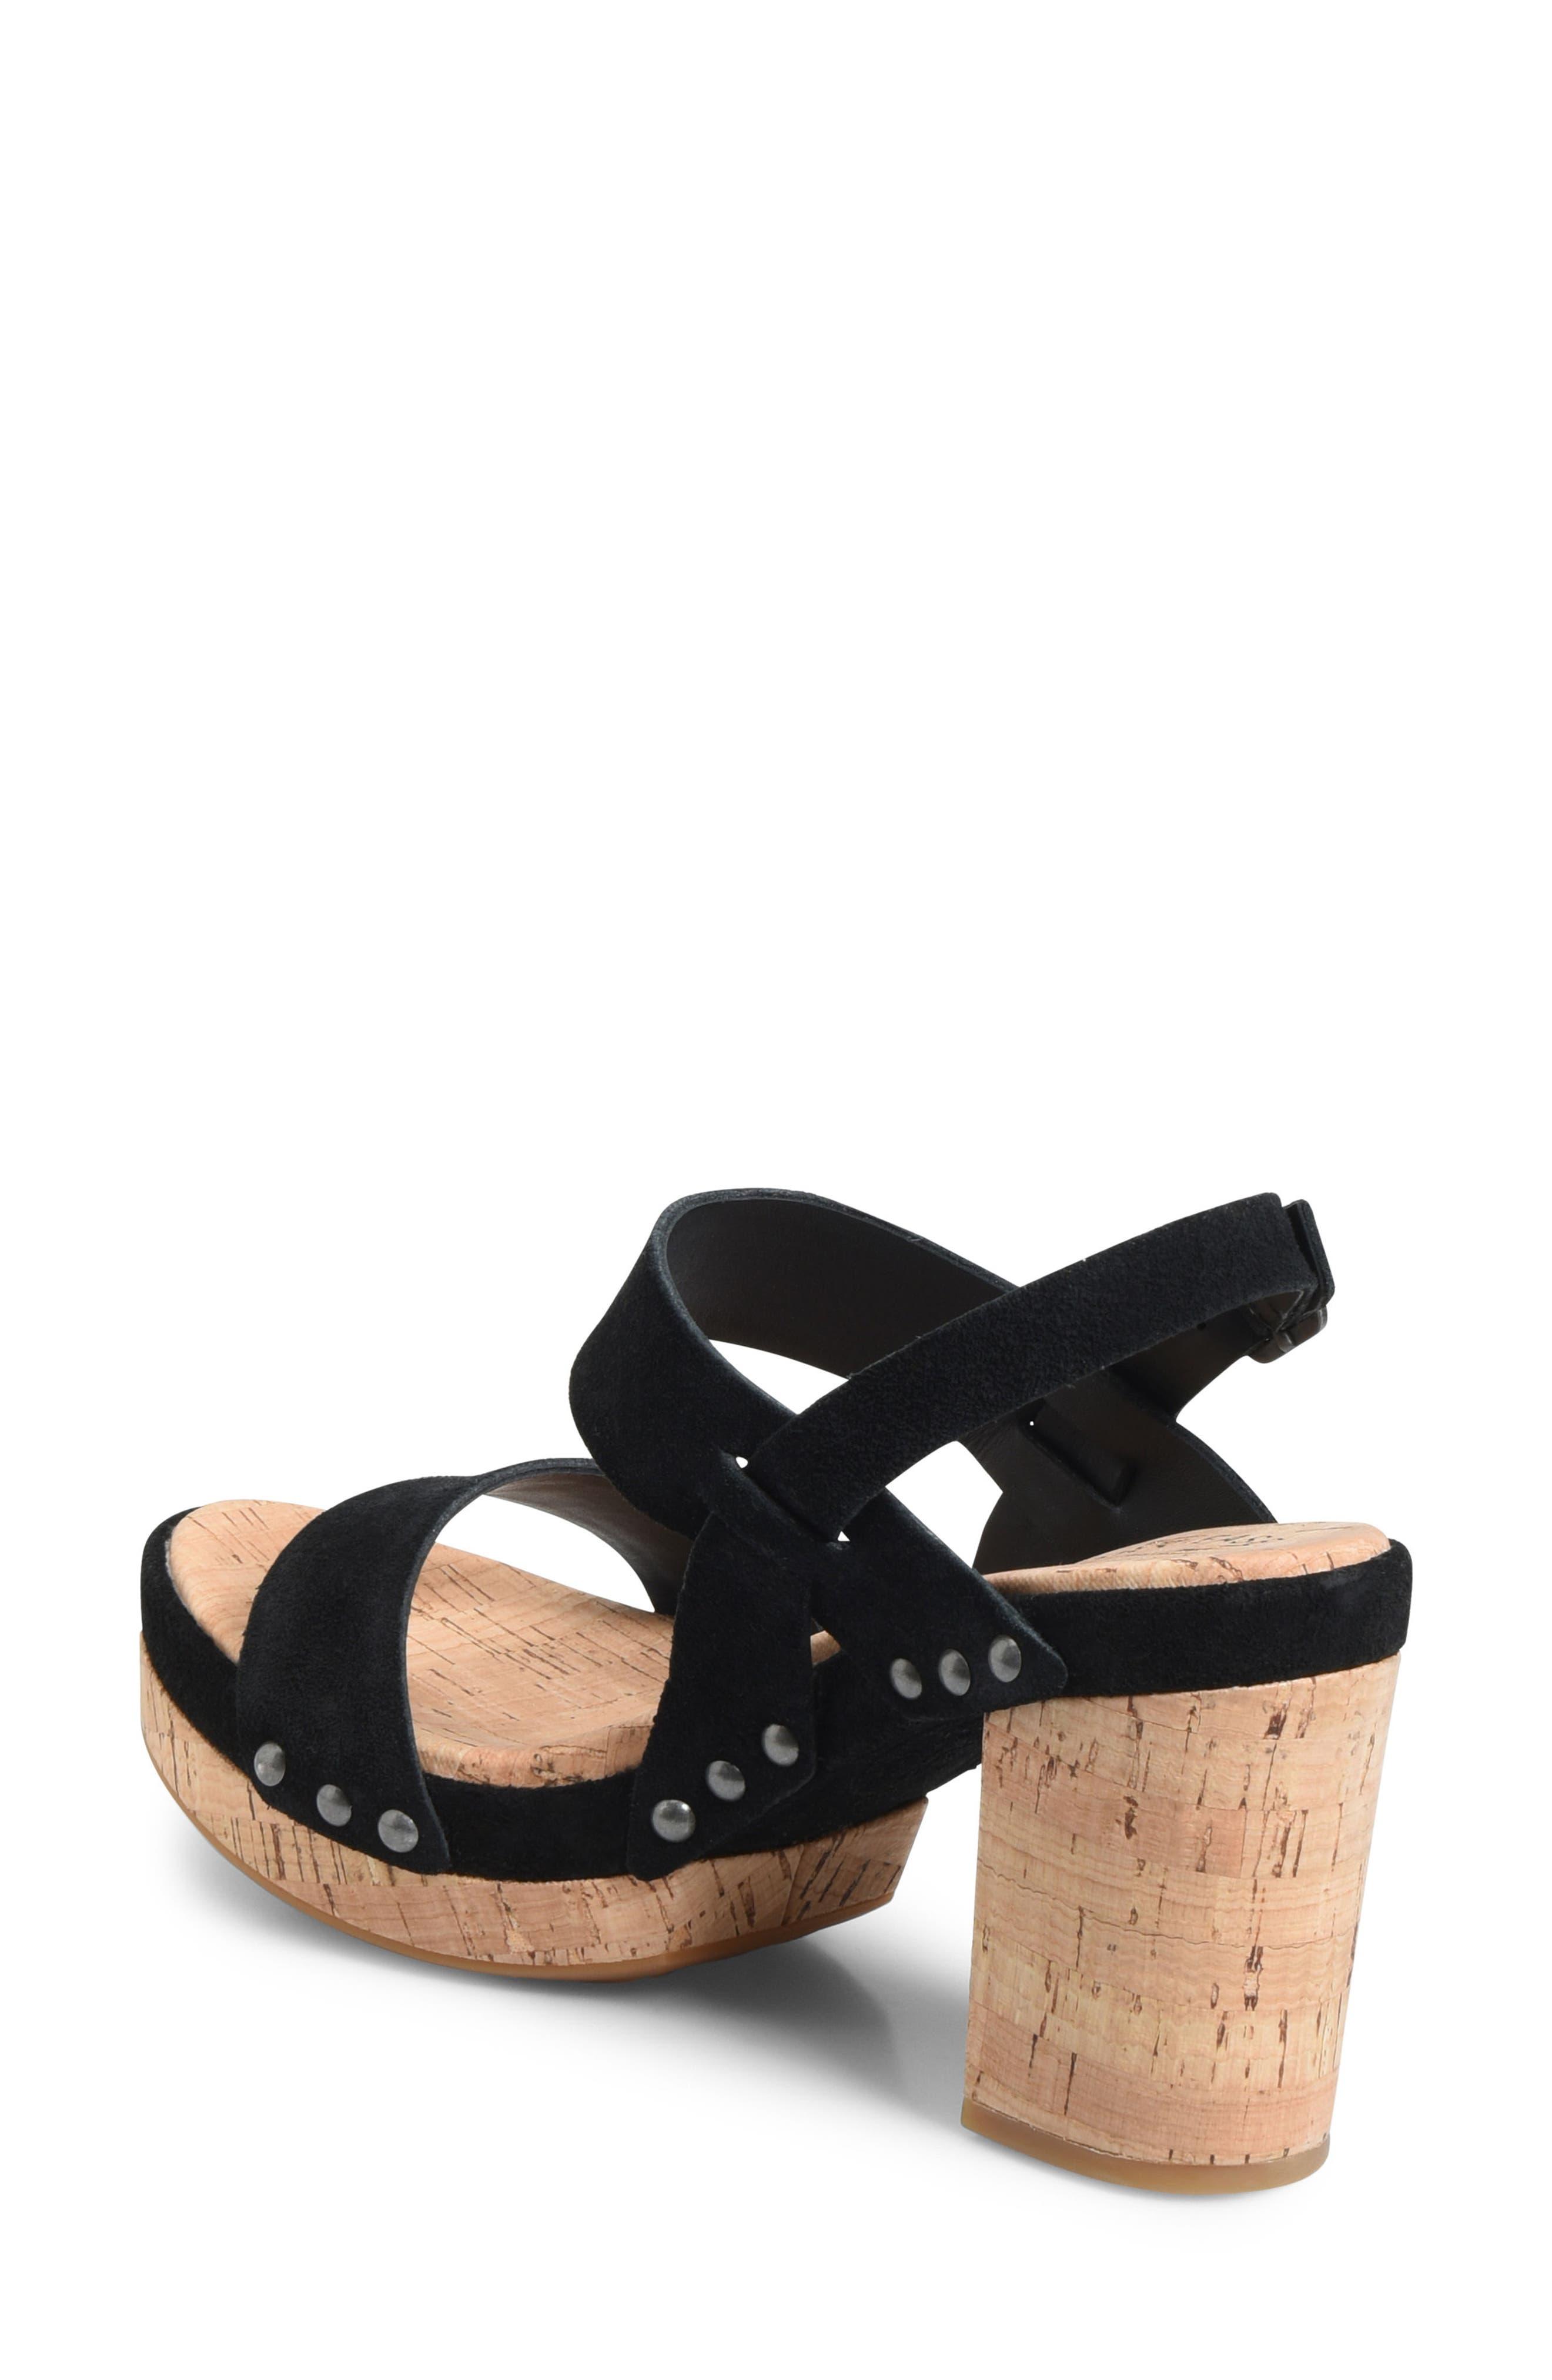 Palmdale Platform Sandal,                             Alternate thumbnail 2, color,                             Black Suede